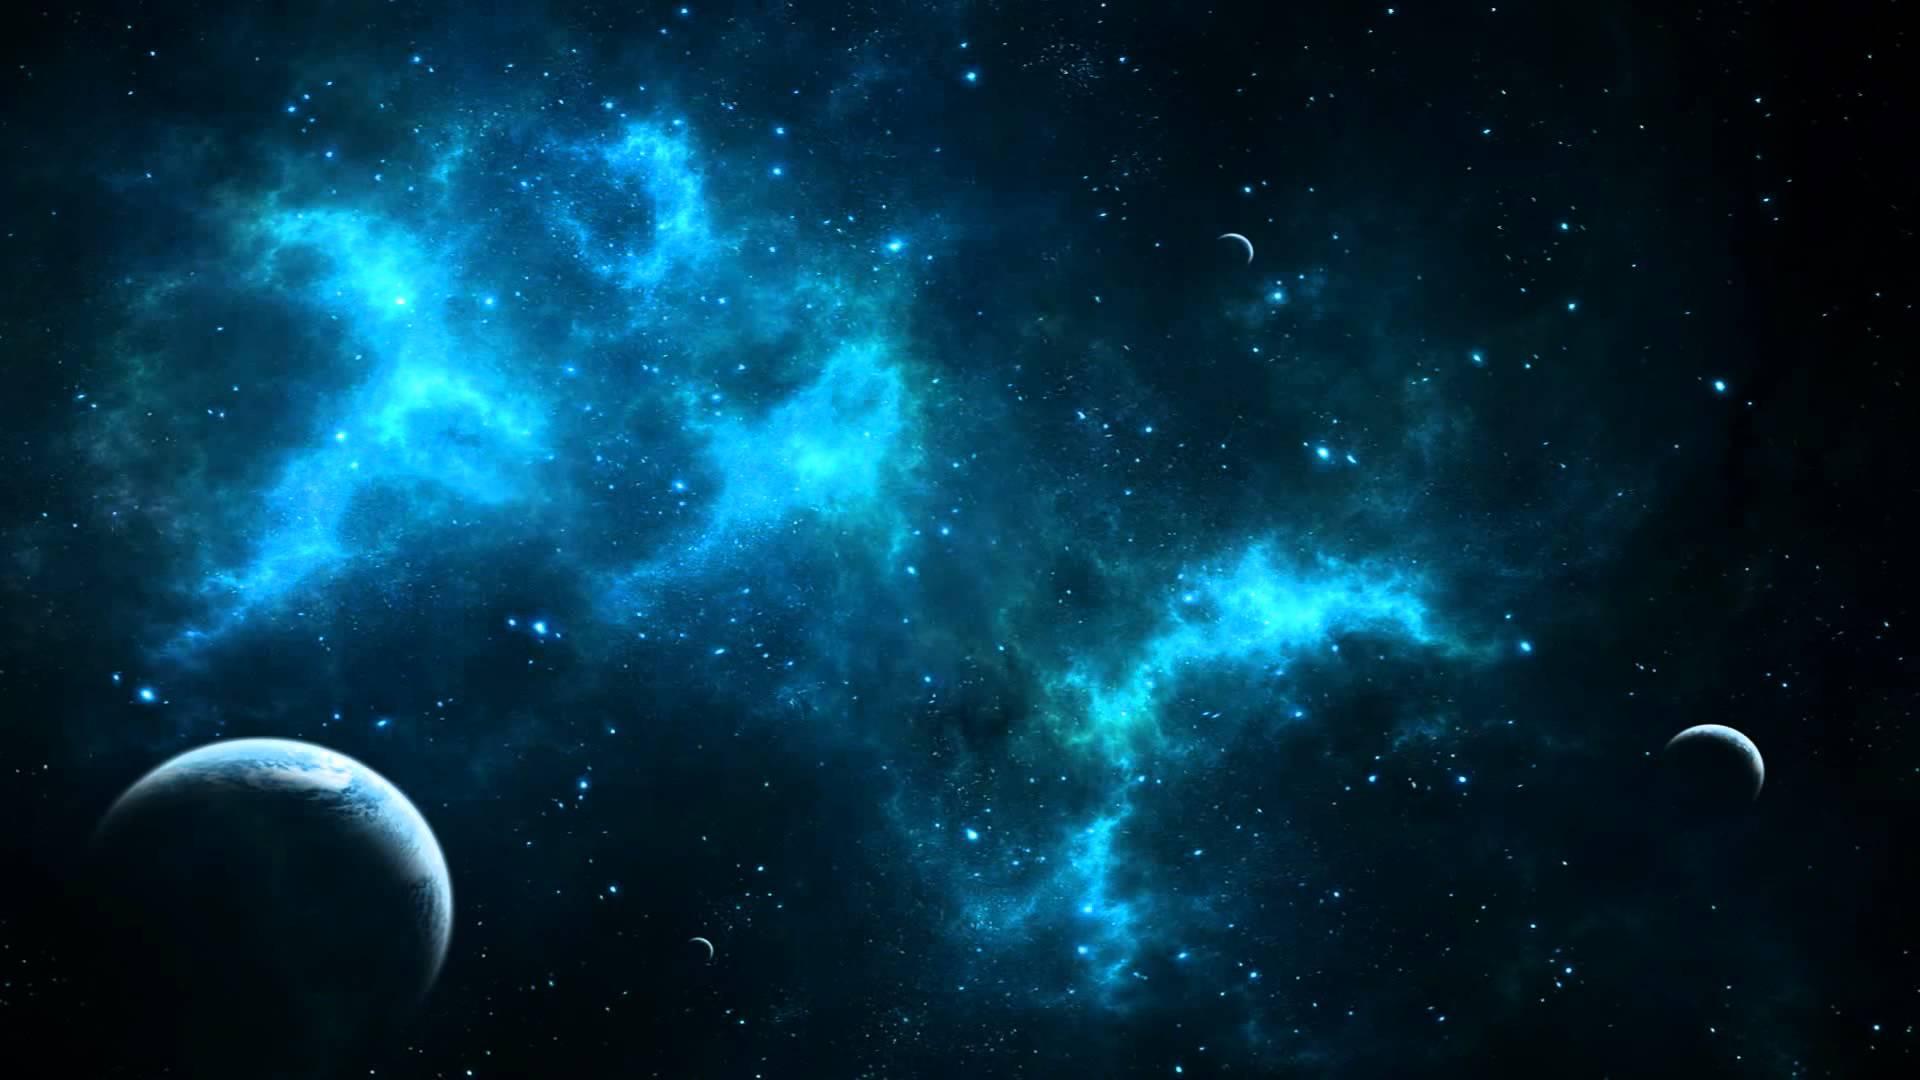 Space Travel Animated Wallpaper httpwwwdesktopanimated 1920x1080